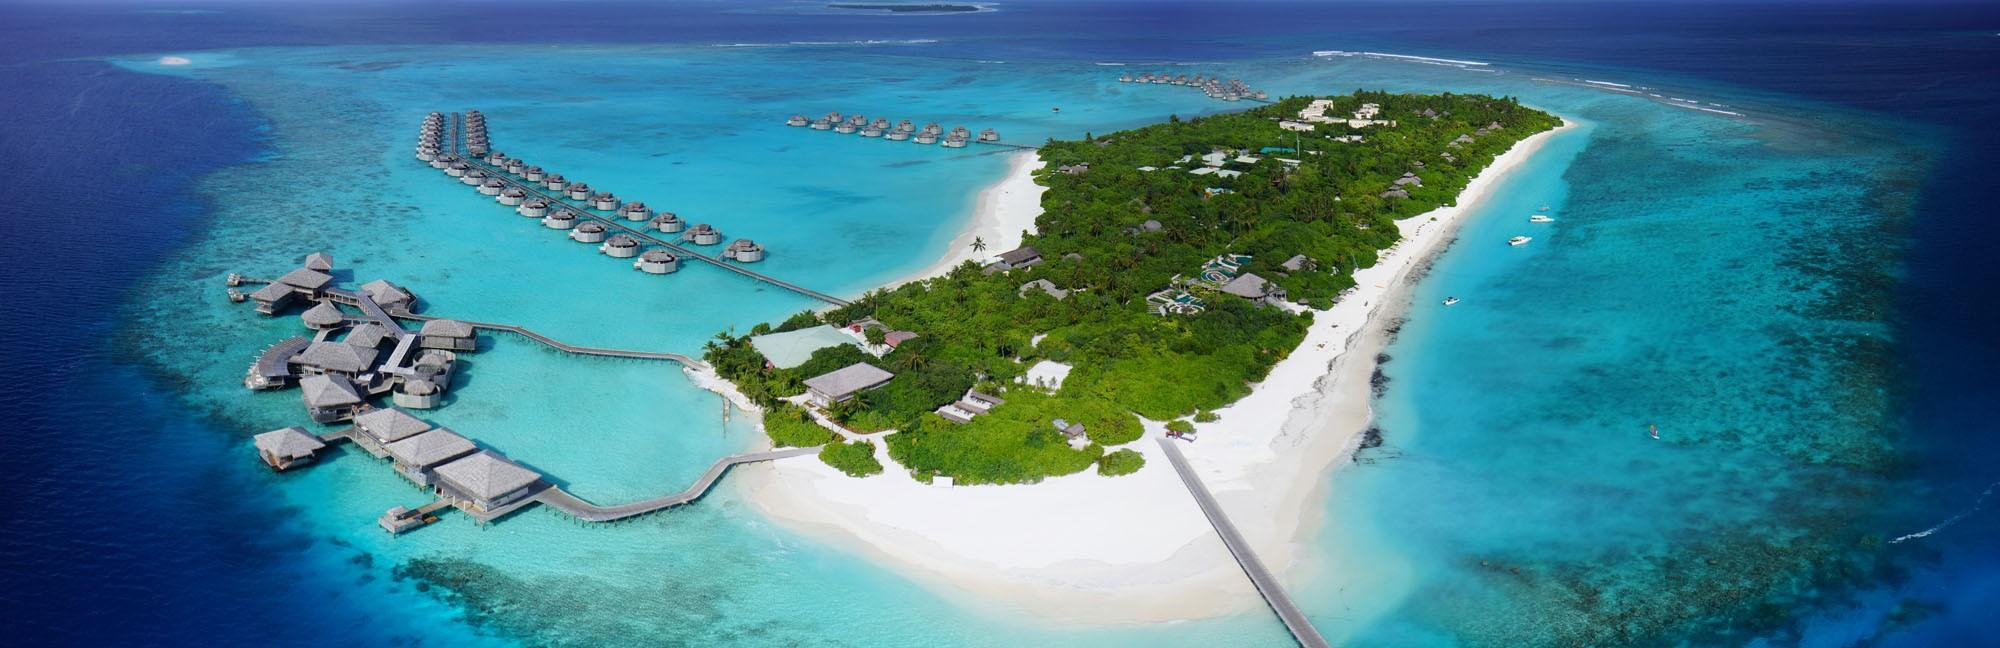 MALDIVAS ... HOTEL SIX SENSES LAAMU